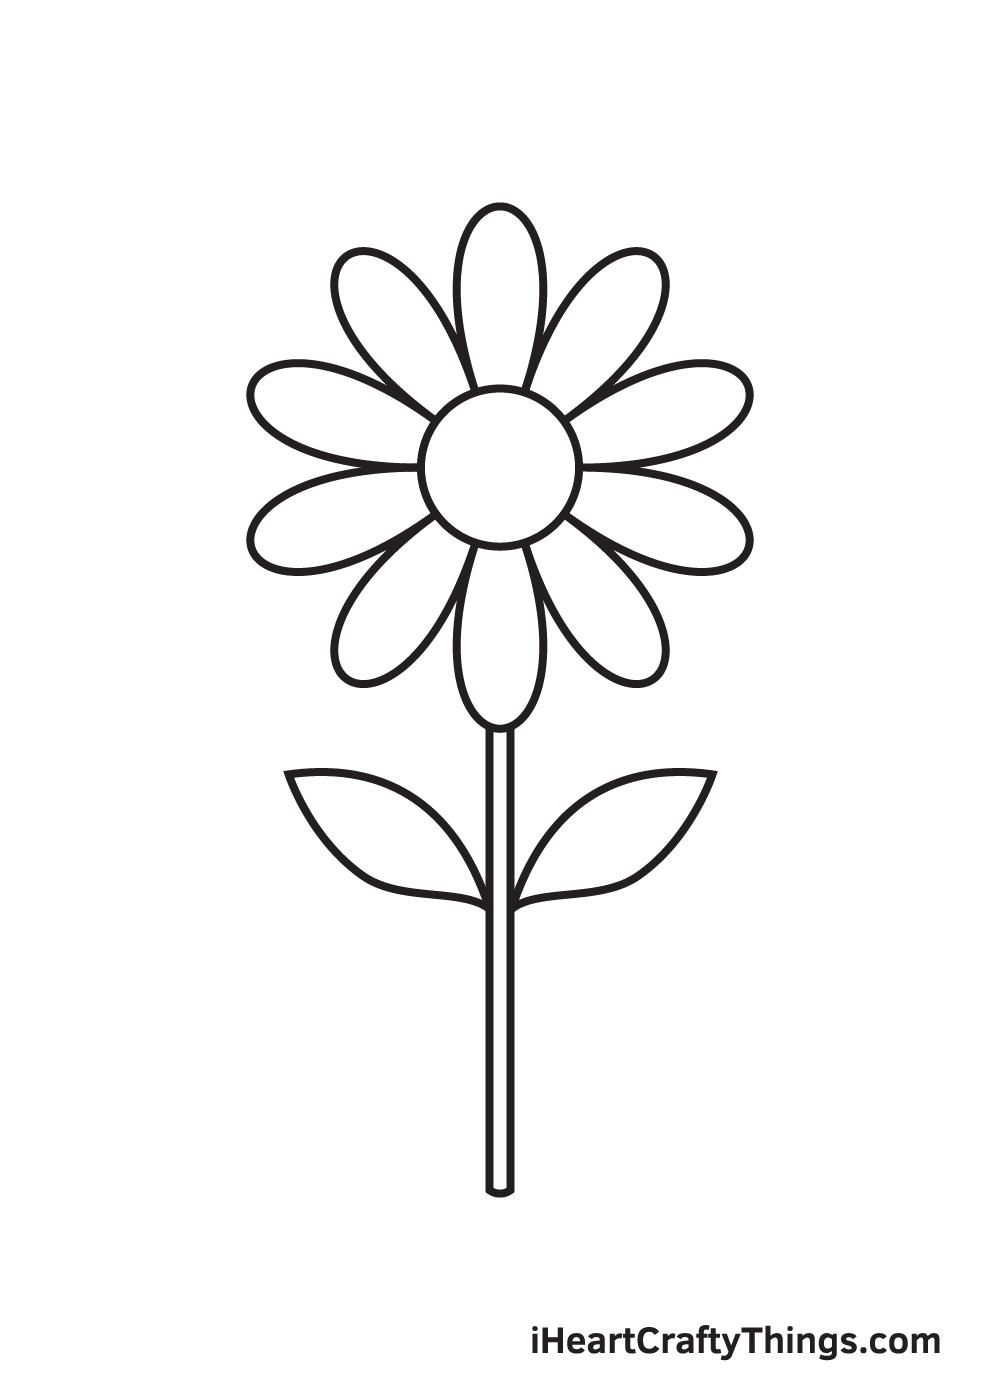 daisy drawing - step 7